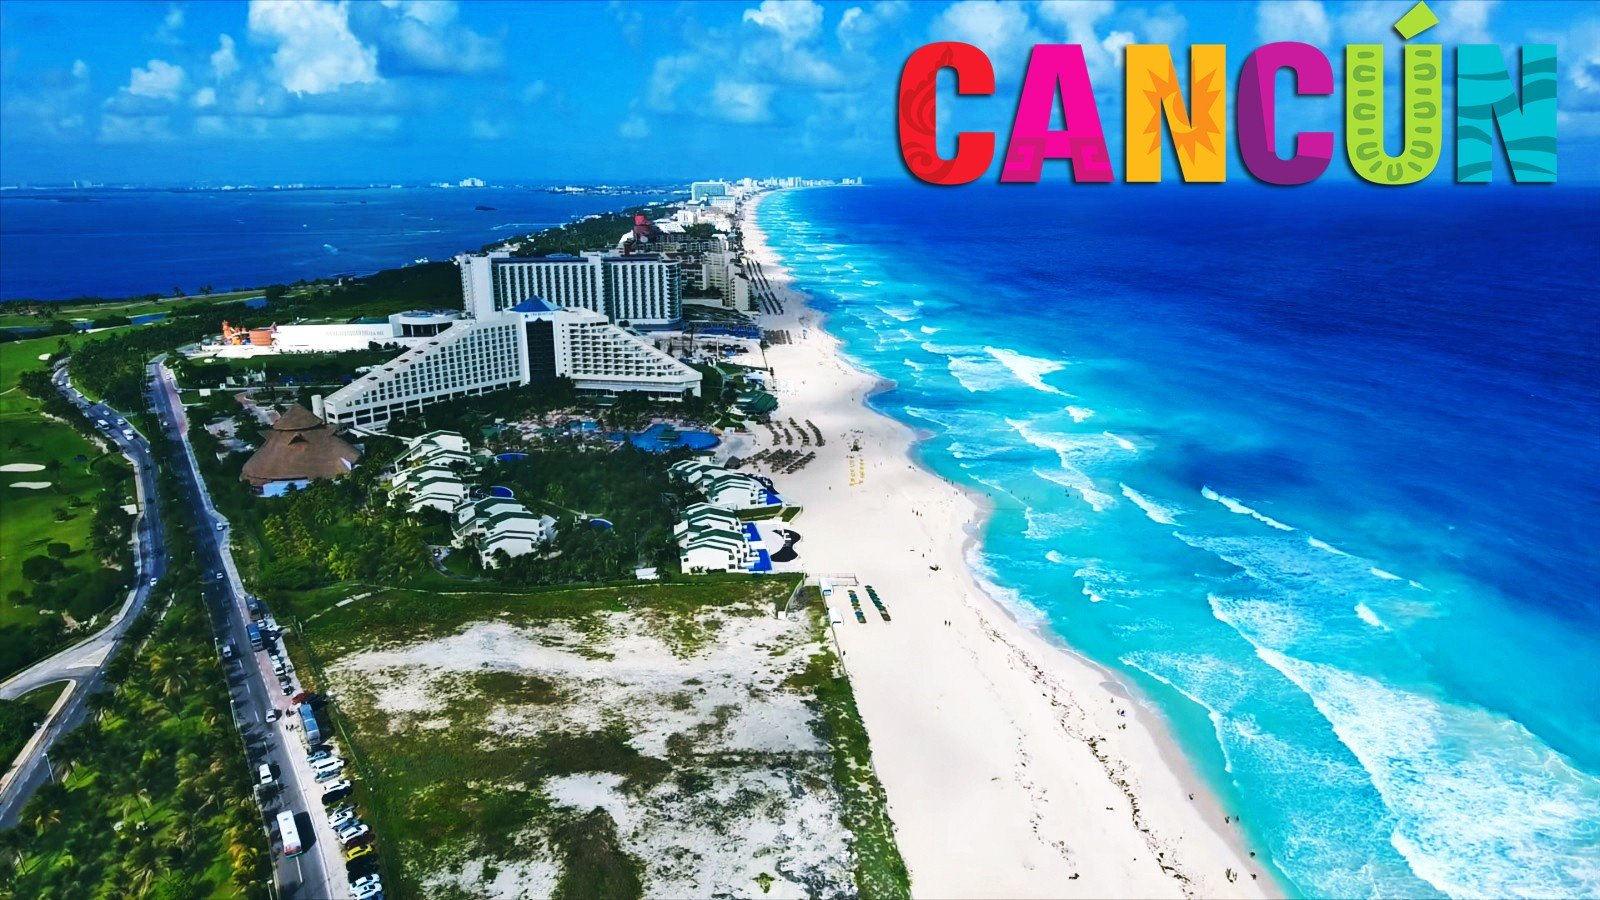 Wallpaper Hd De Cancun